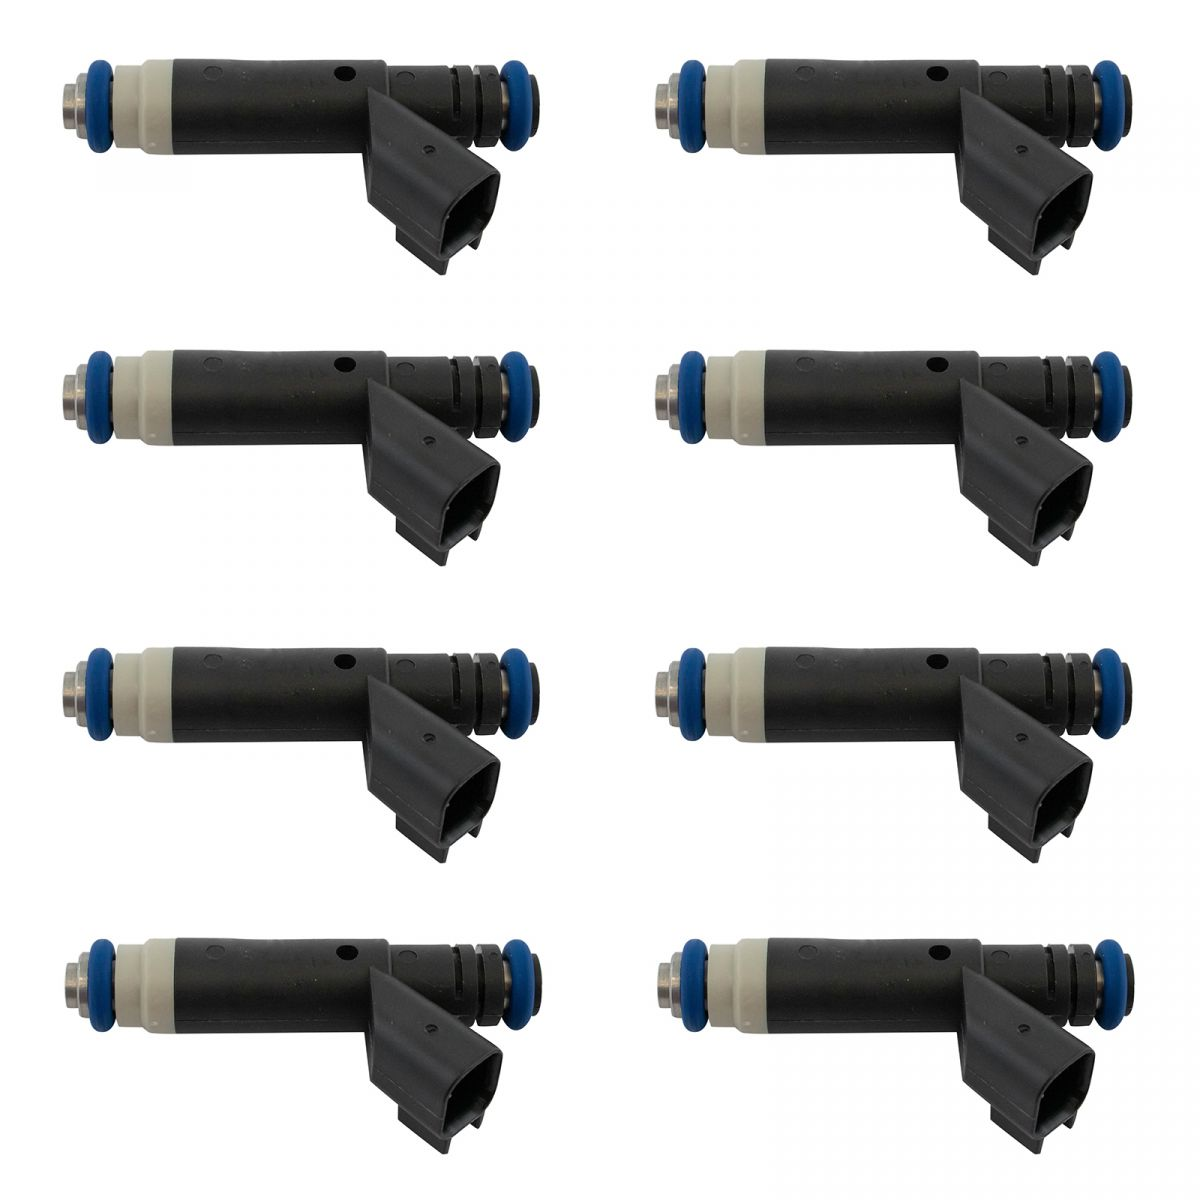 Engine Fuel Injector 8 Piece Set For Ford 4 6l Sohc V8 New